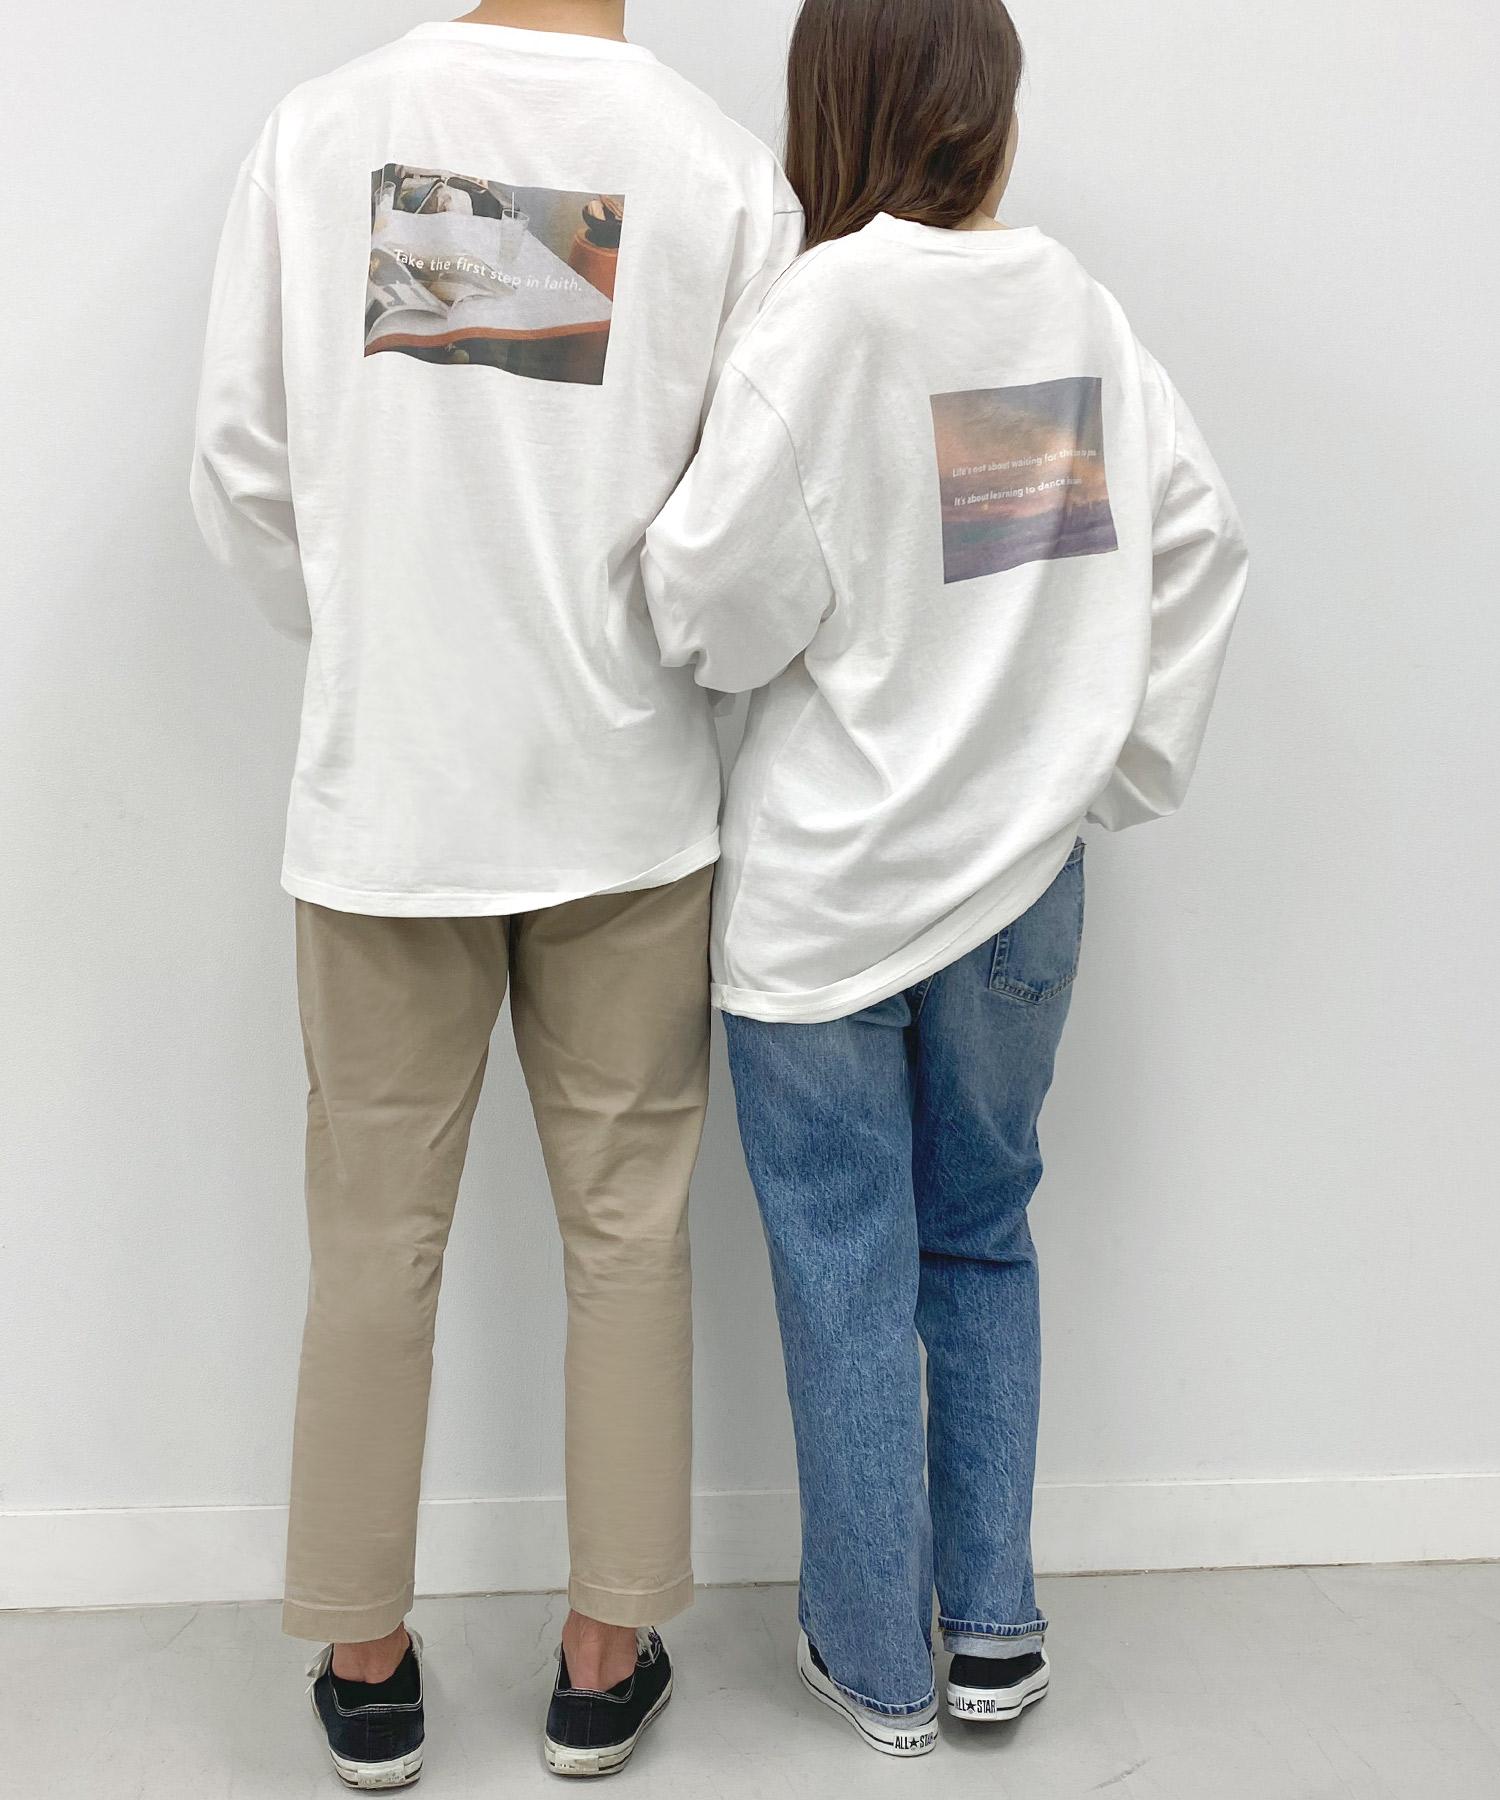 Tシャツ ロゴ&フォトプリント Airi Kato Tina×mimi toujours